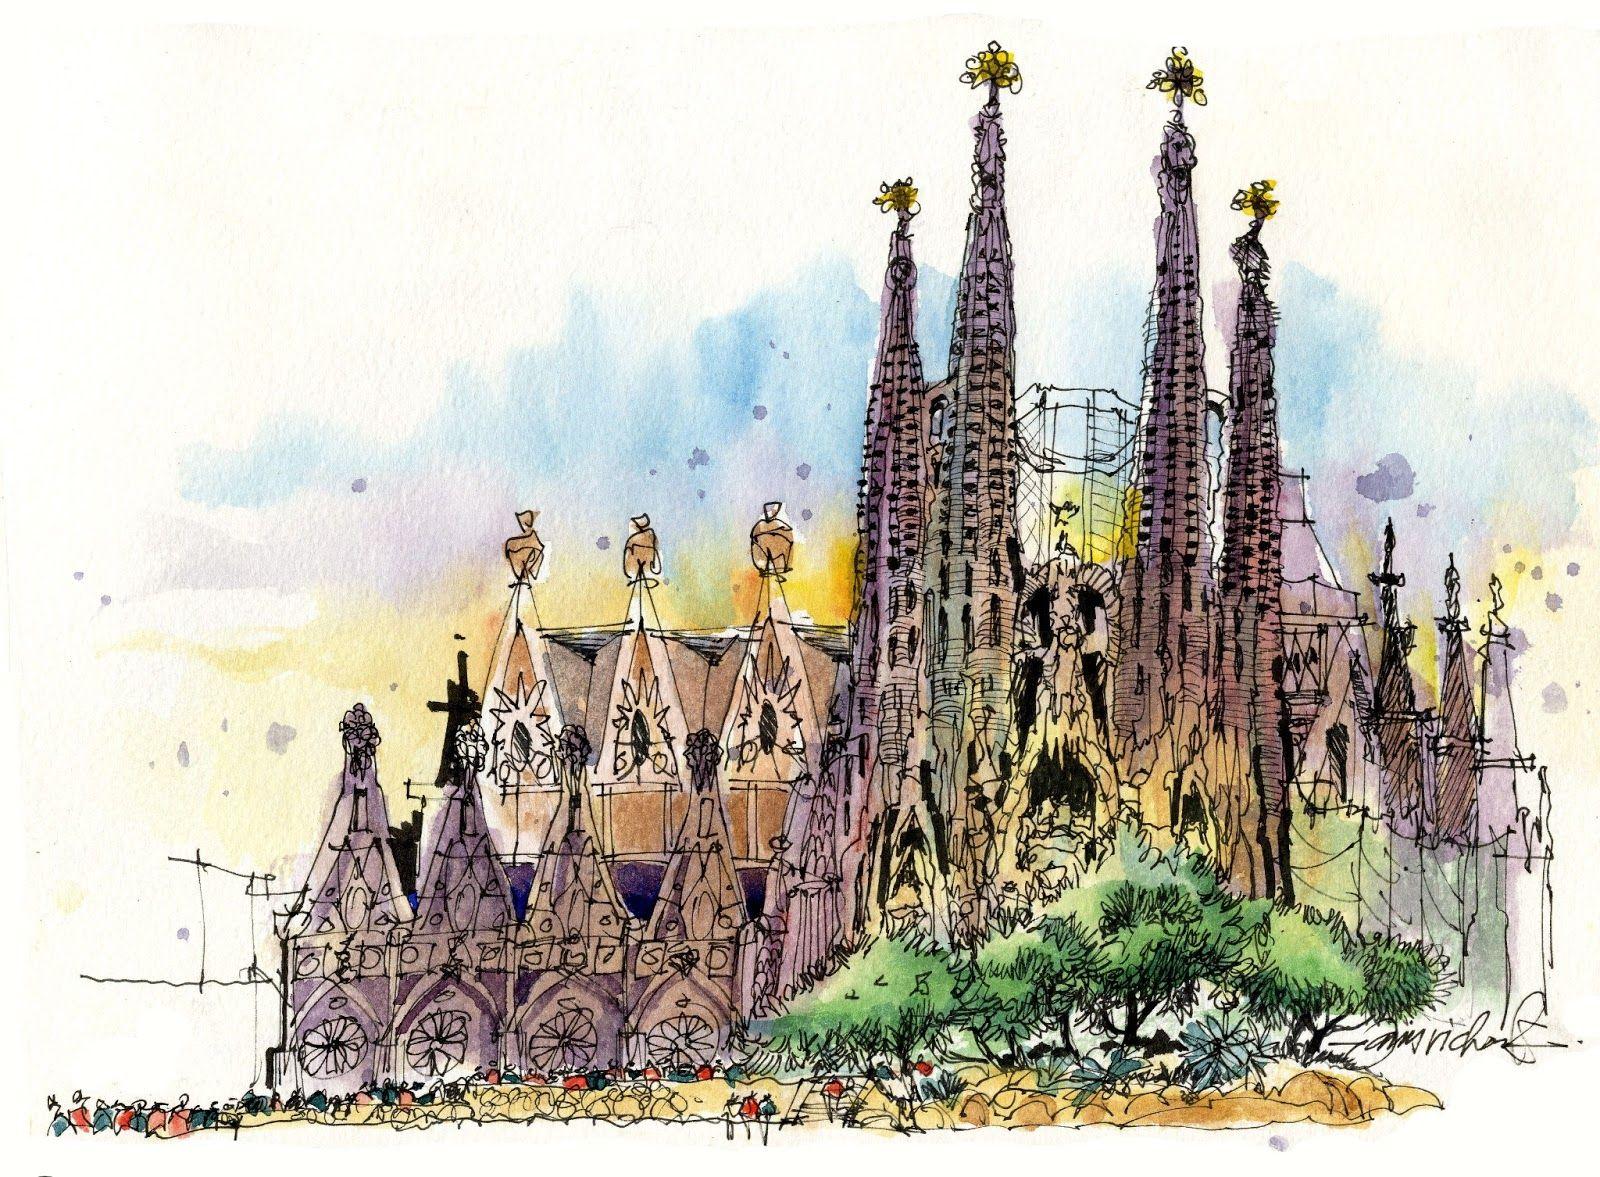 Return from Barcelona   Urban sketching, Urban sketchers, City sketch